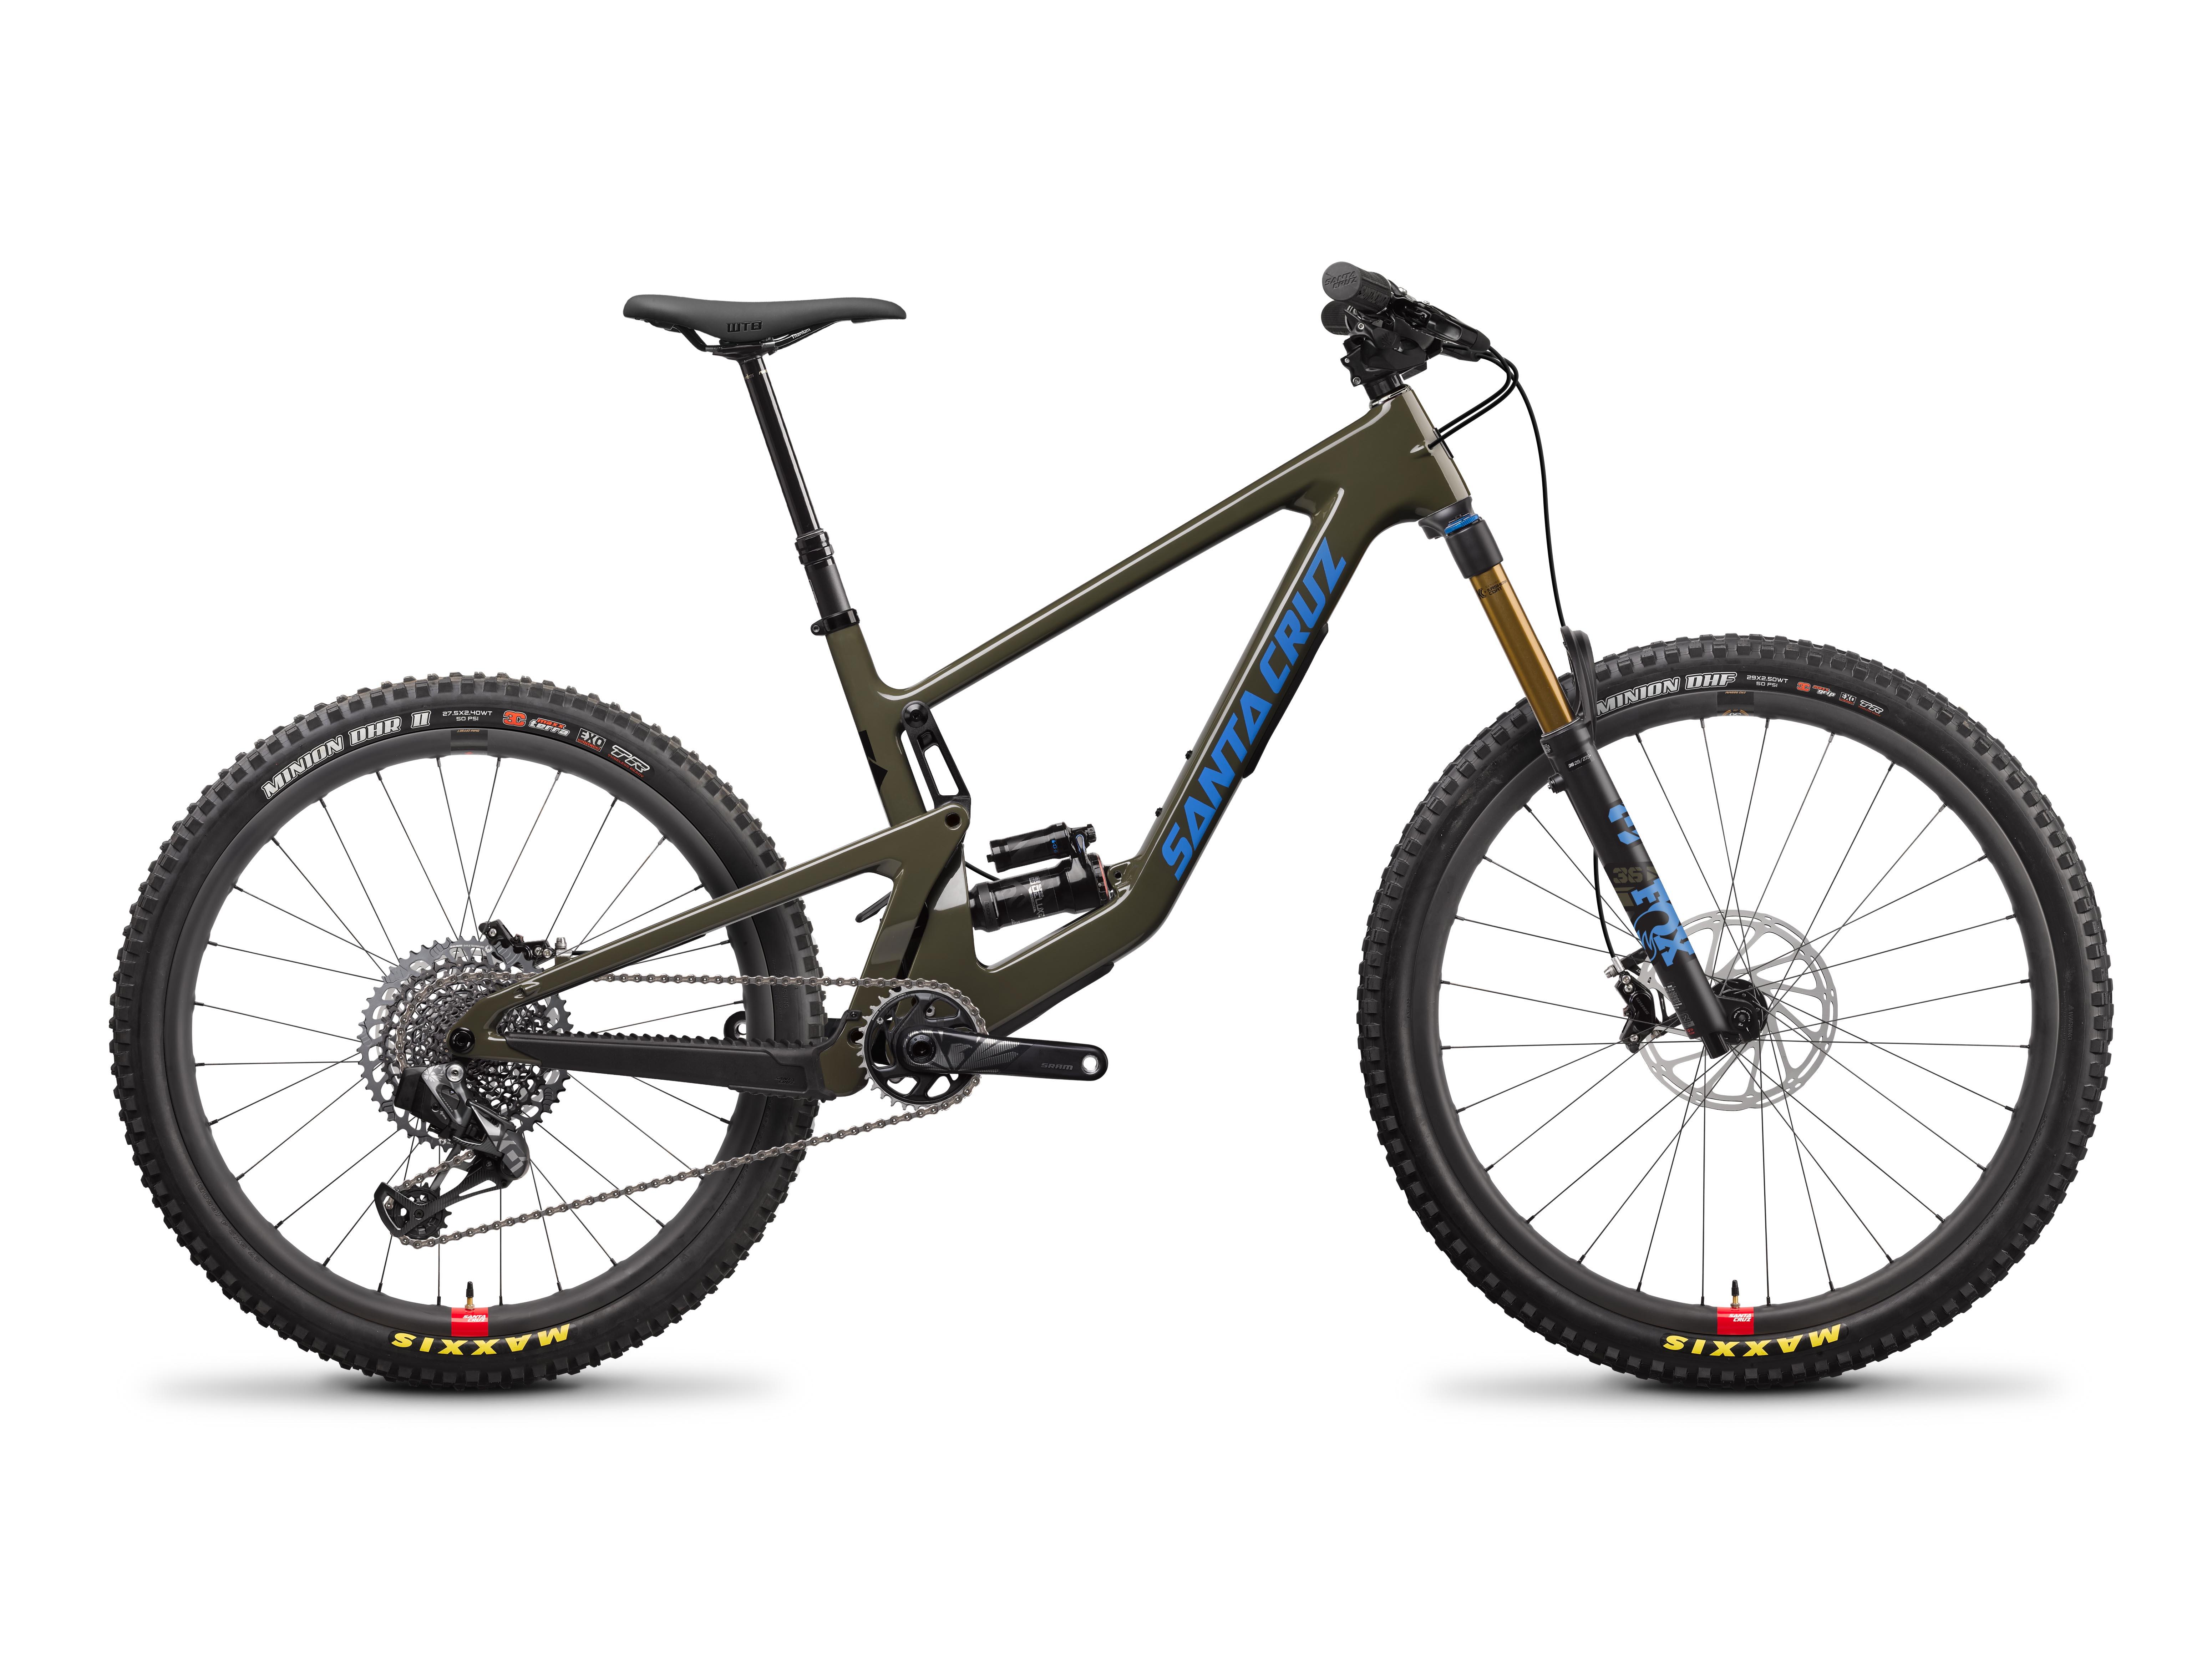 Image of Santa Cruz Bronson CC X01 AXS Reserve MX Mountain Bike 2022 Moss Green